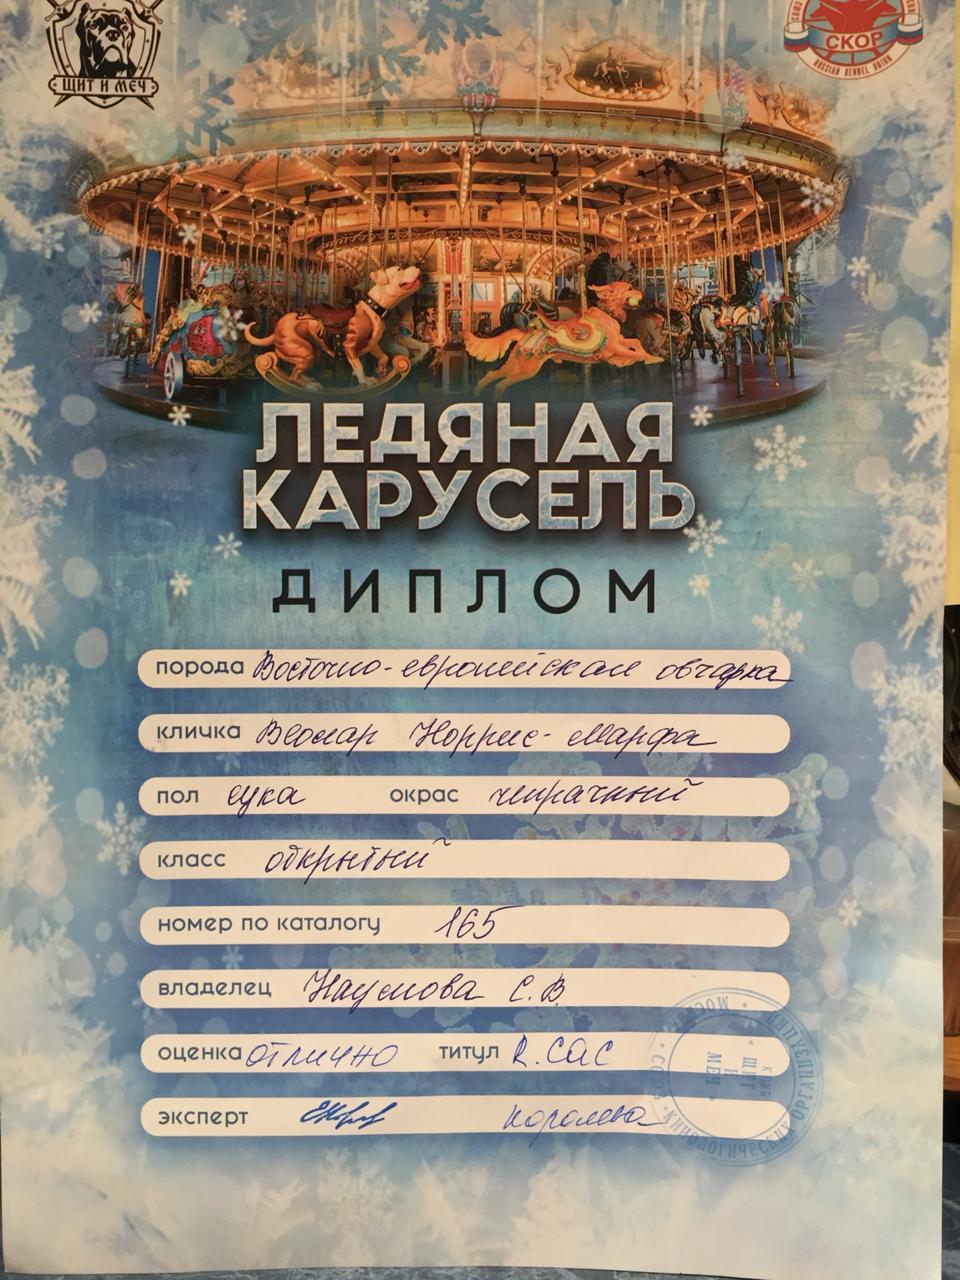 веолар - ВОСТОЧНО-ЕВРОПЕЙСКАЯ ОВЧАРКА ВЕОЛАР НОРРИС-МАРФА - Страница 2 S_aaau10